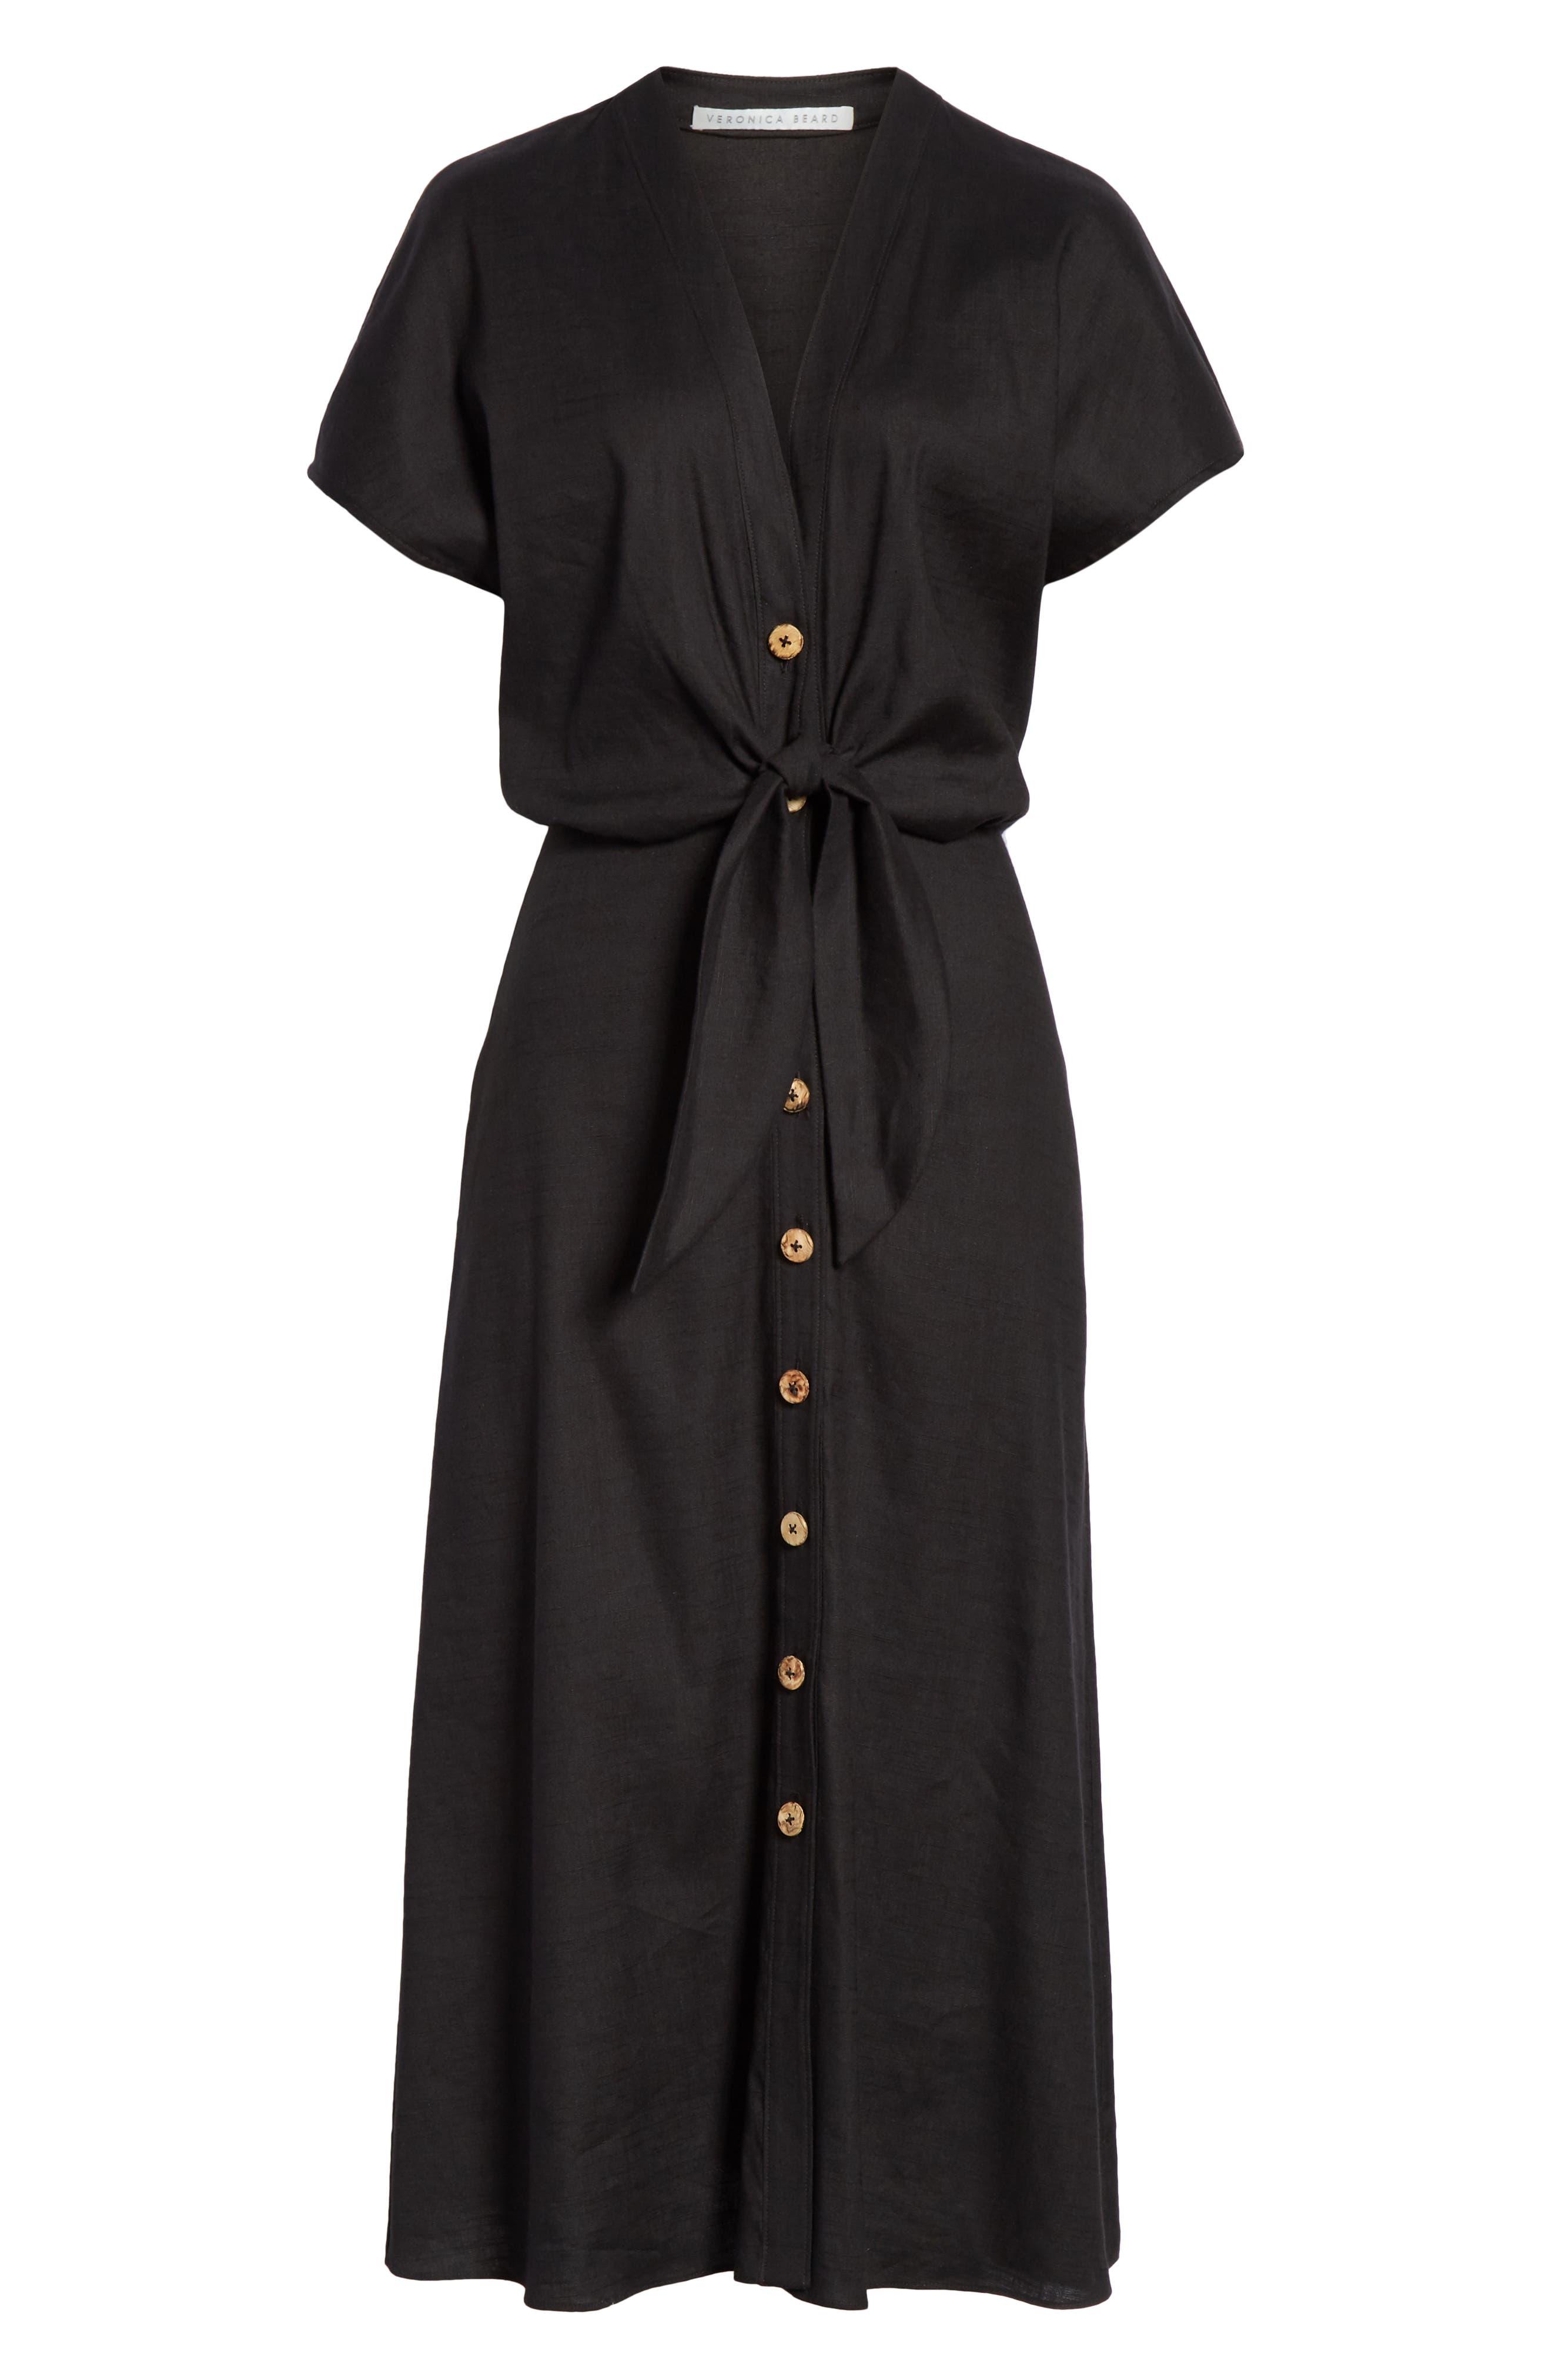 VERONICA BEARD, Giana Tie Waist Linen Blend Midi Dress, Alternate thumbnail 7, color, BLACK